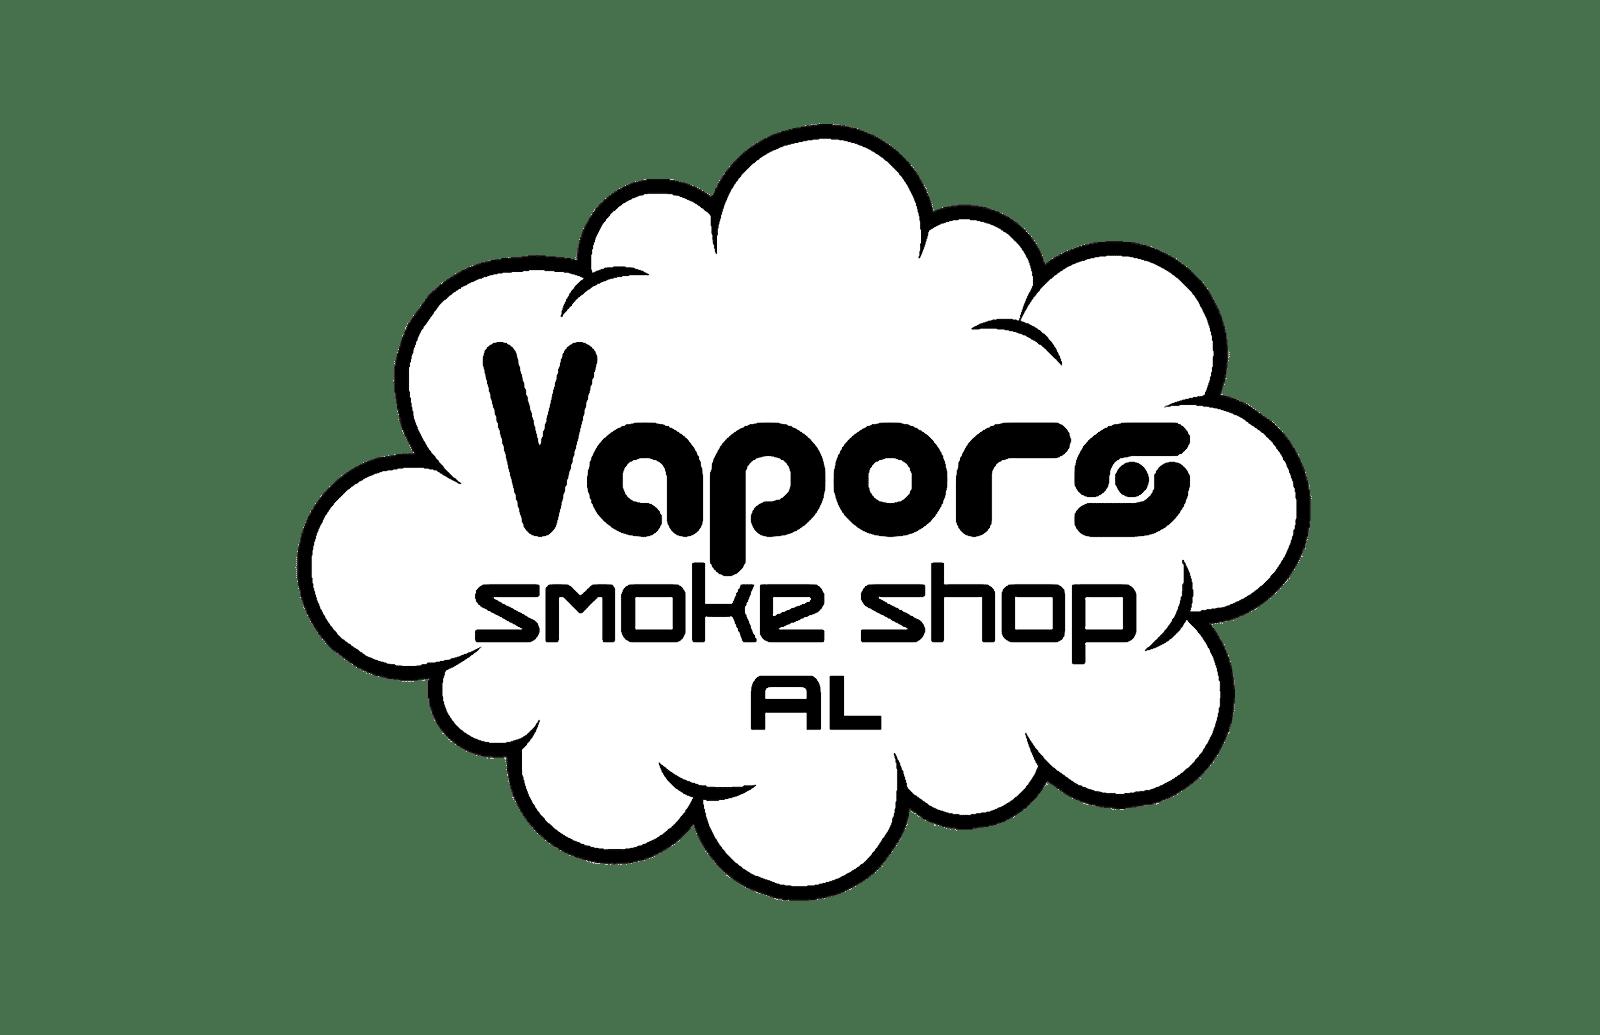 Vapors Smokeshop